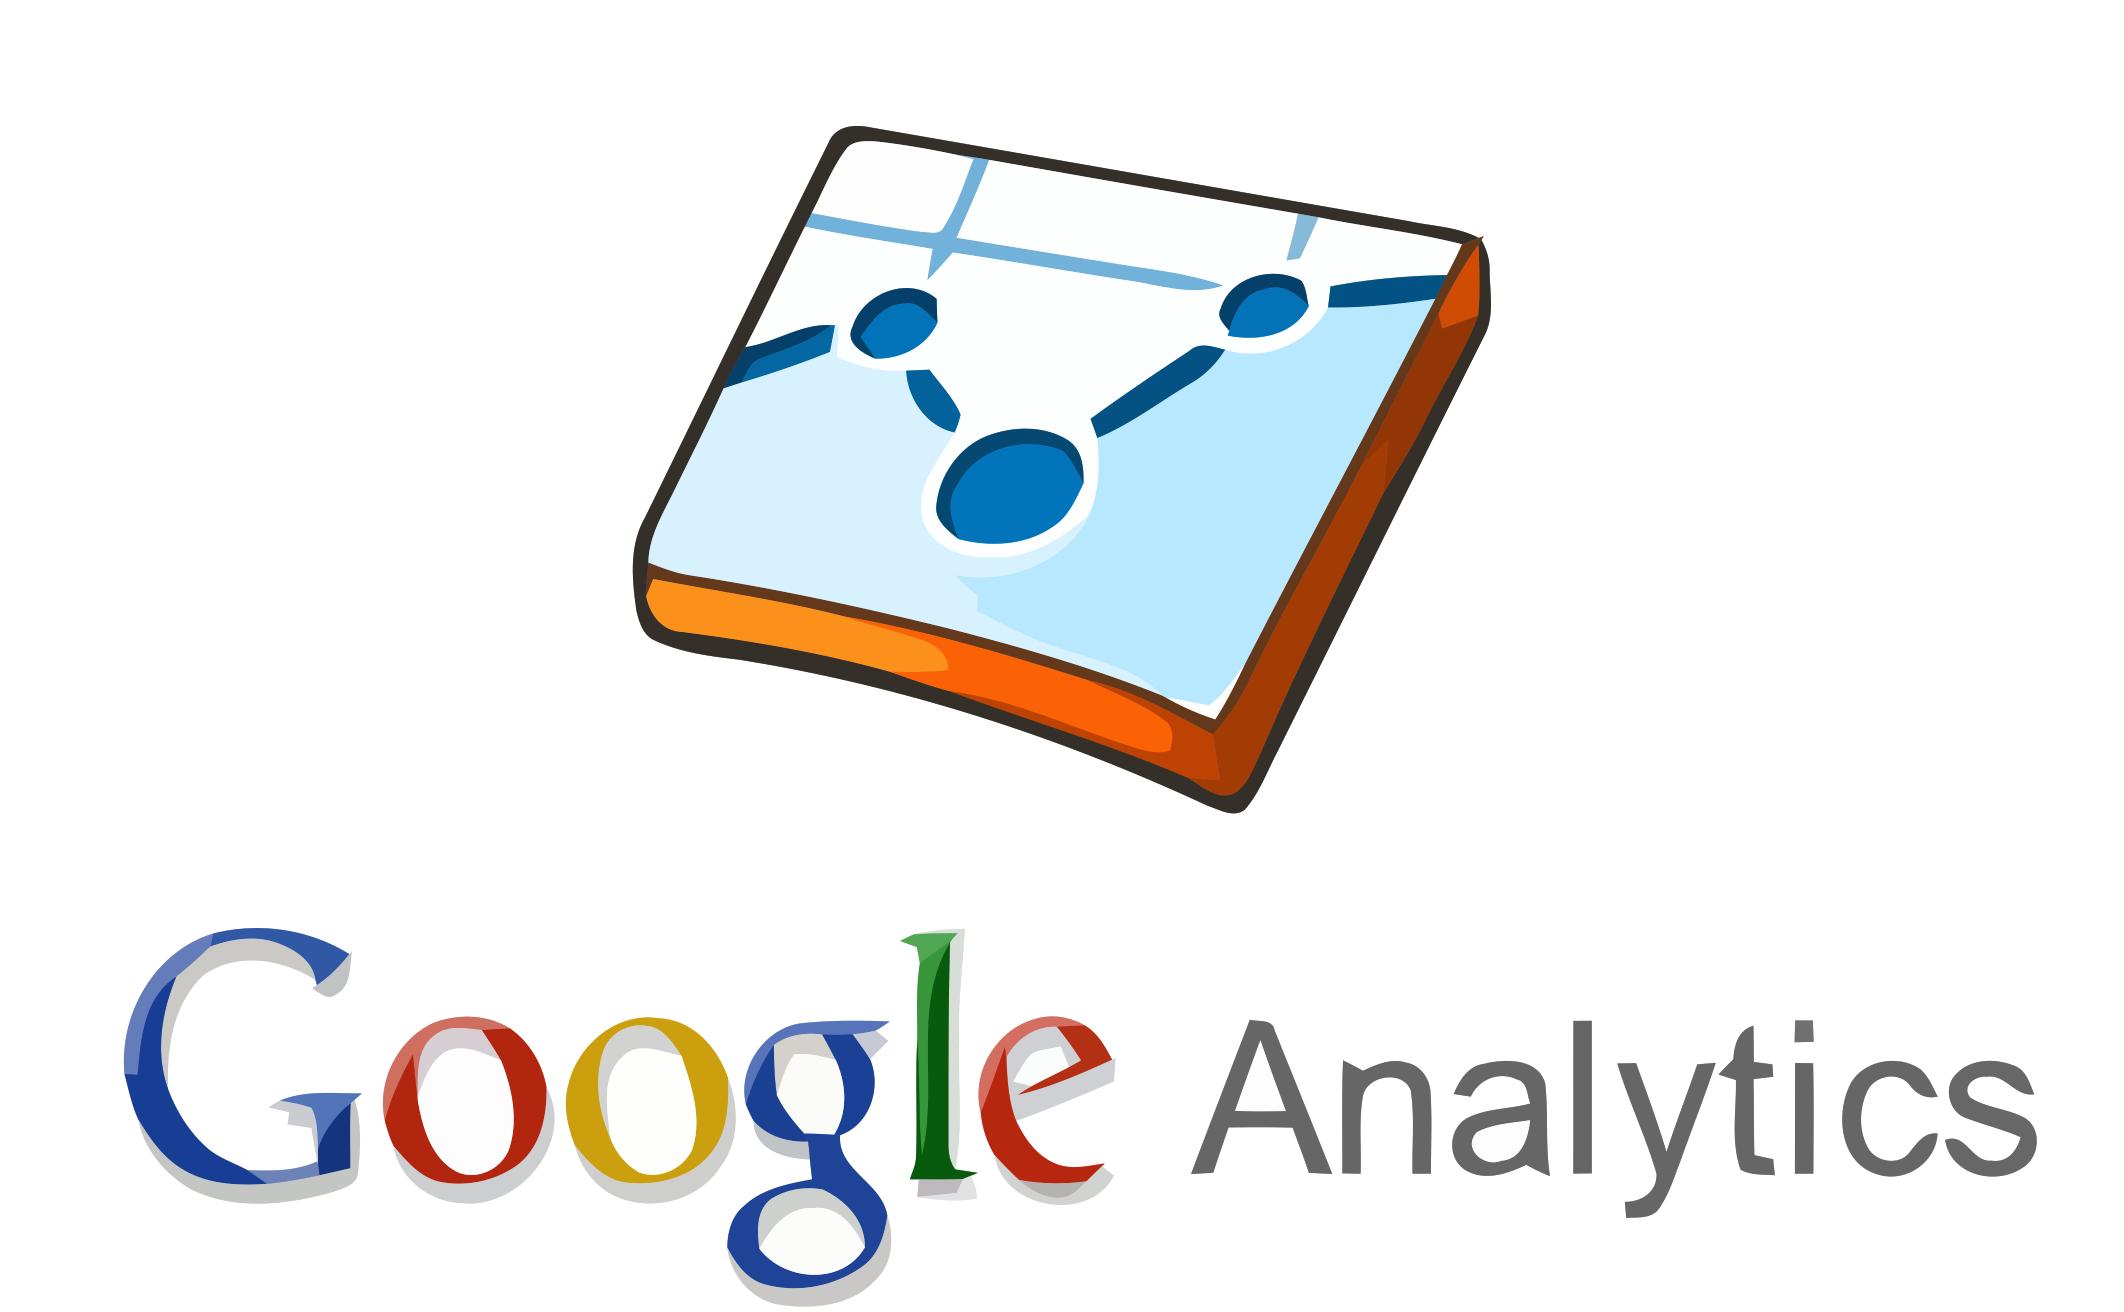 Google Analytics, kazalnik obiskanosti